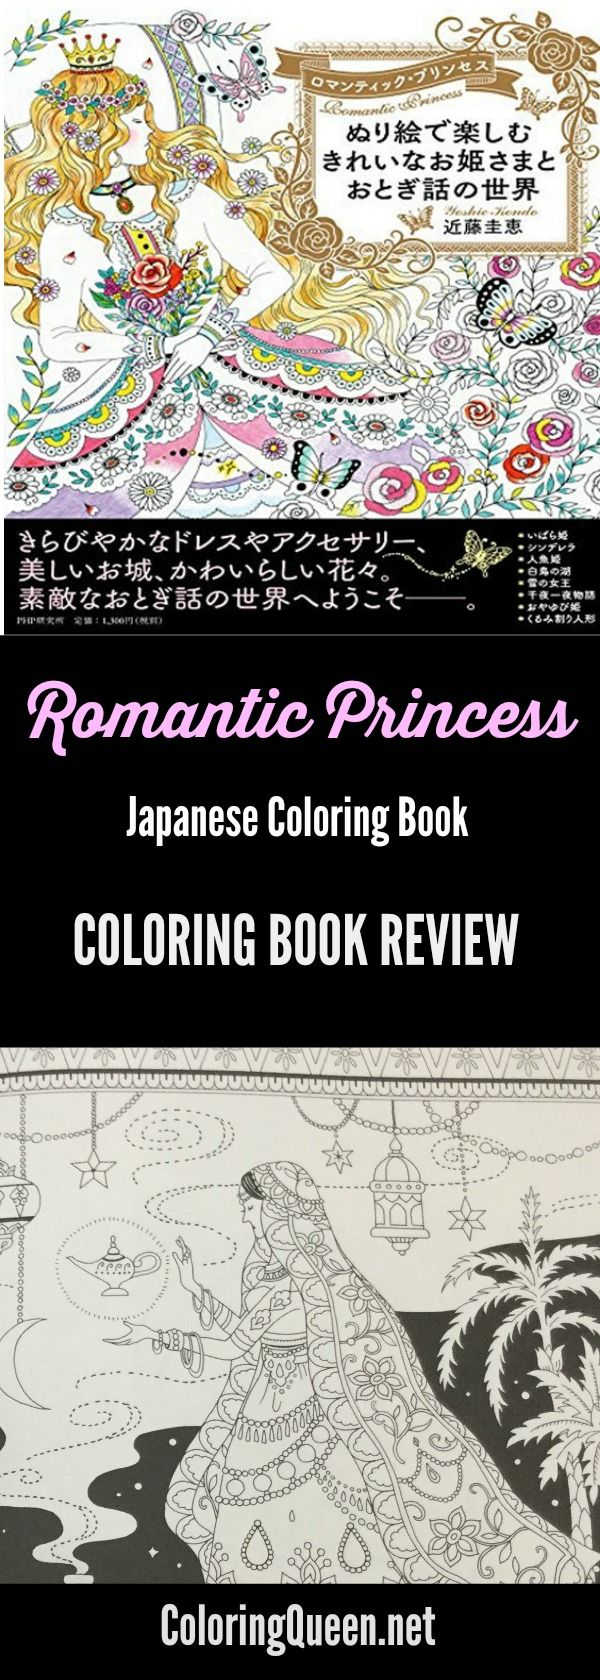 The coloring book analysis - Romantic Princess Coloring Book Review